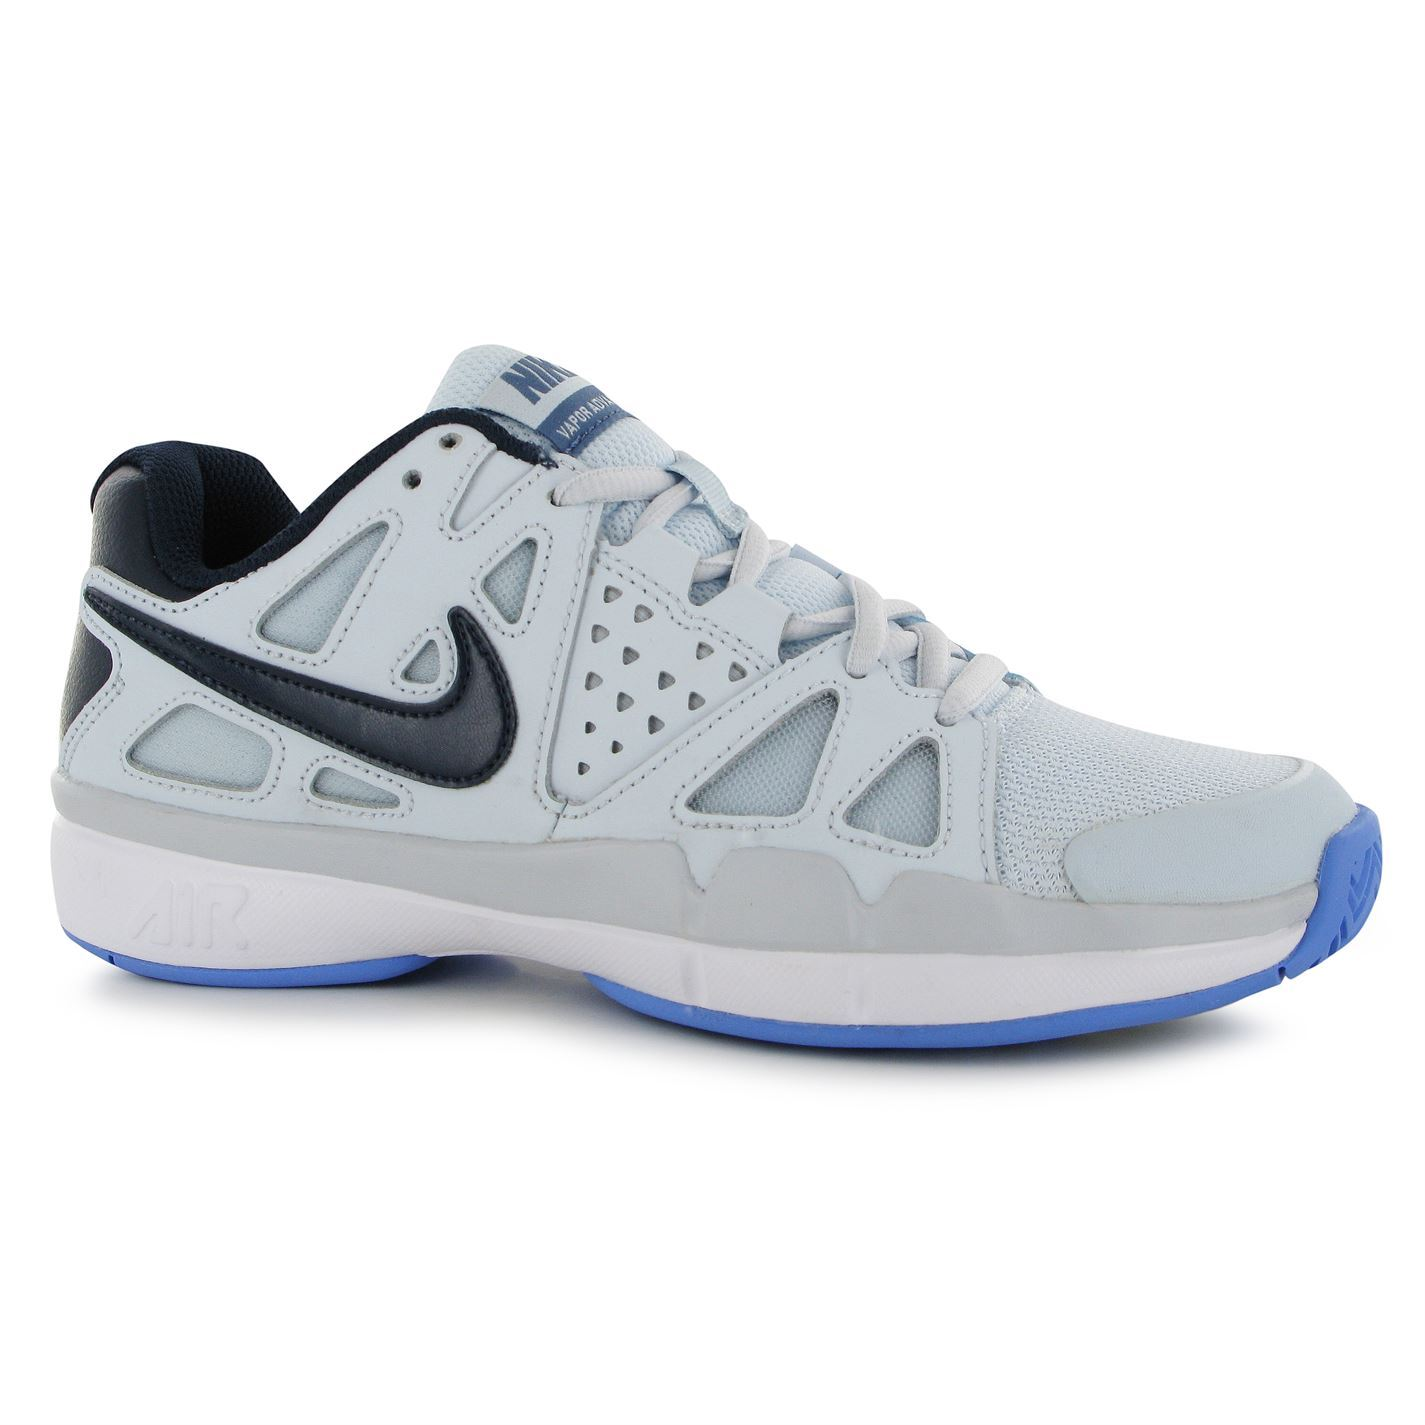 nike air vapor advantage tennis shoes womens blue navy